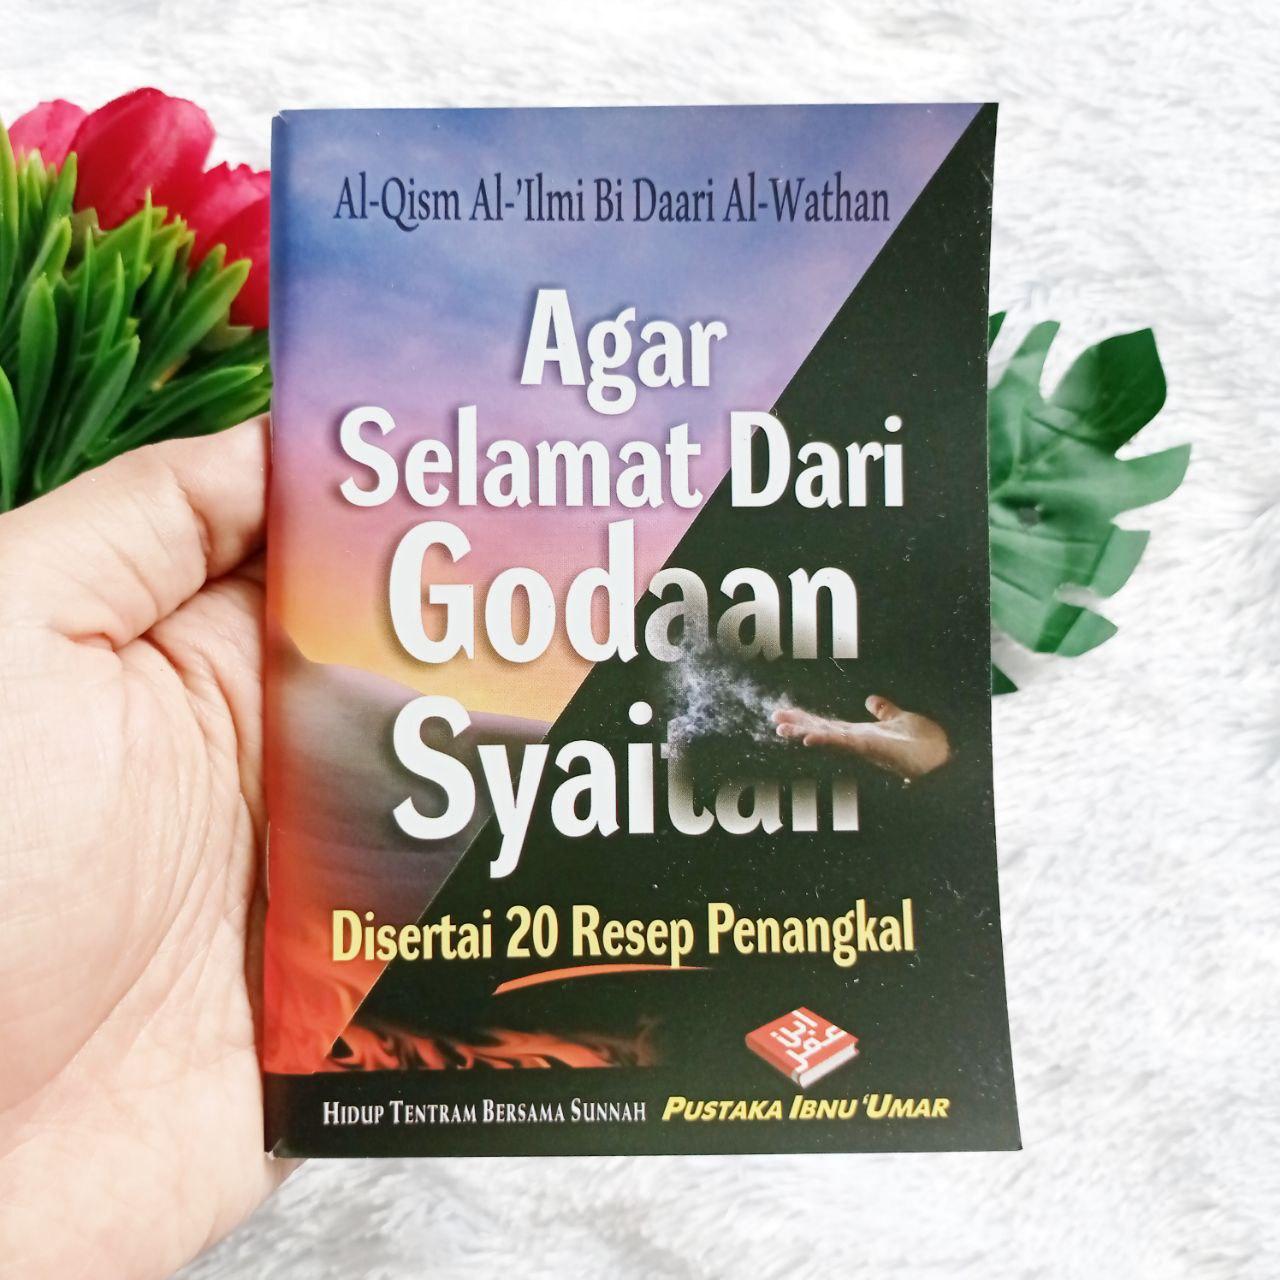 Buku Saku Agar Selamat Dari Godaan Syaitan Plus 20 Resep Penangkalnya